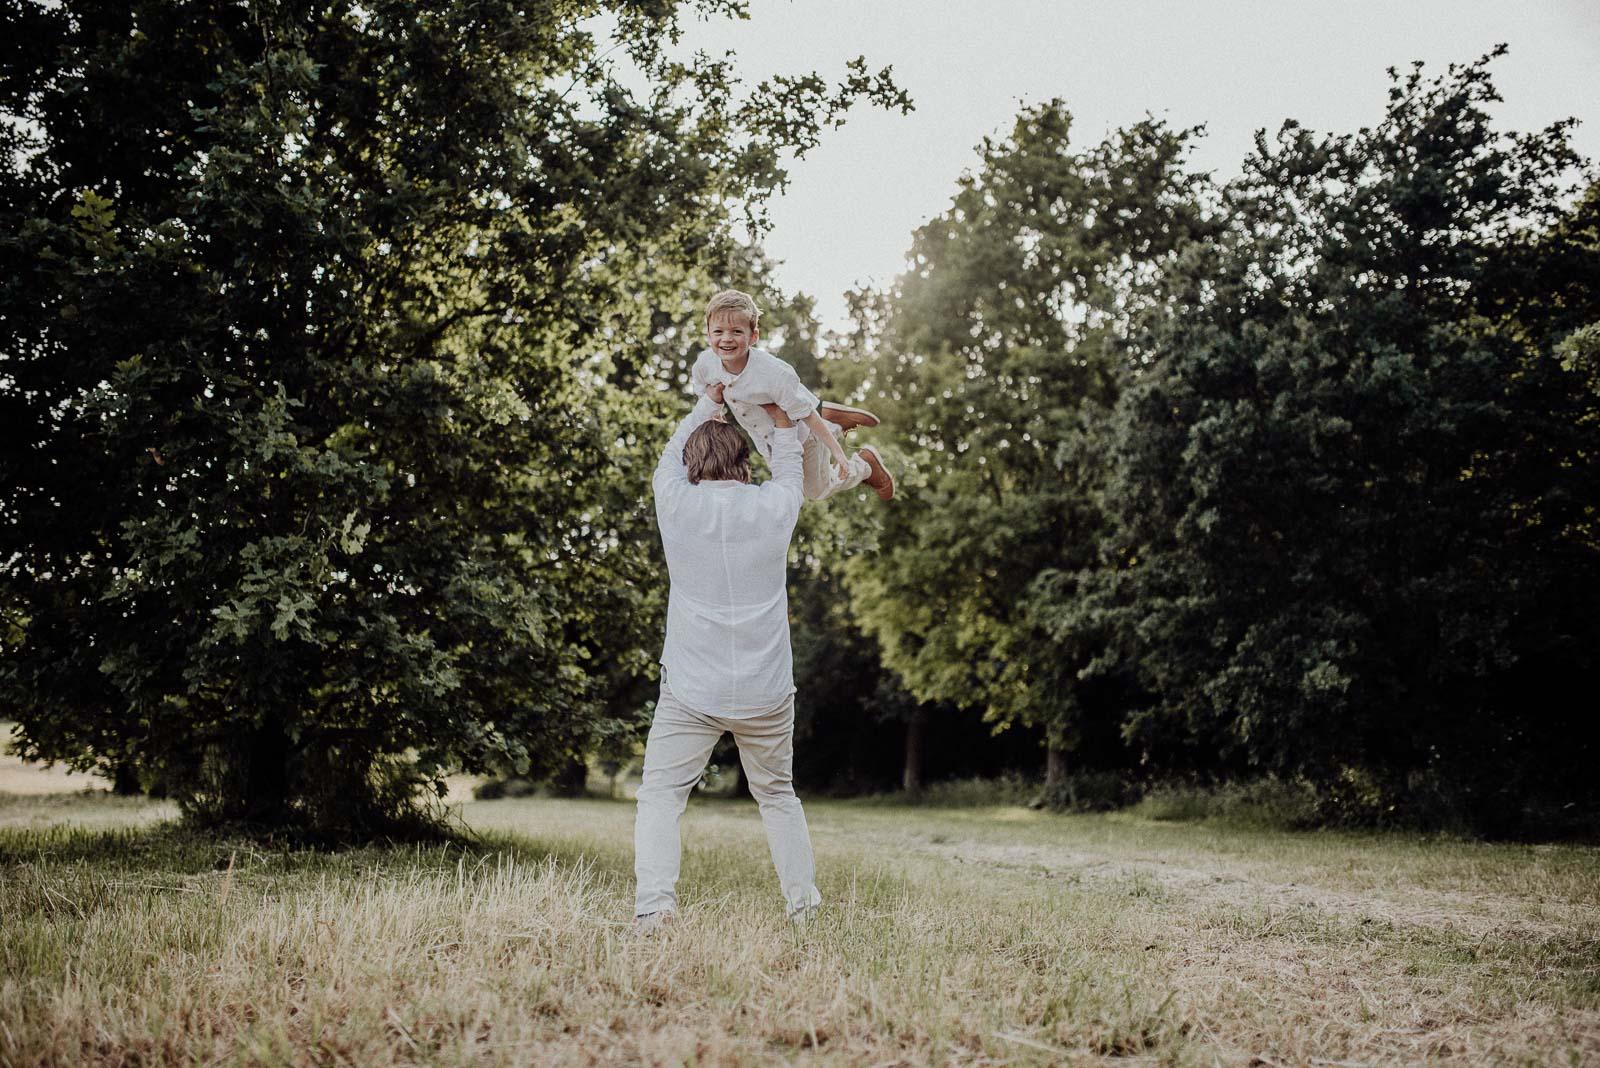 028-familien-fotoshooting-herne-heide